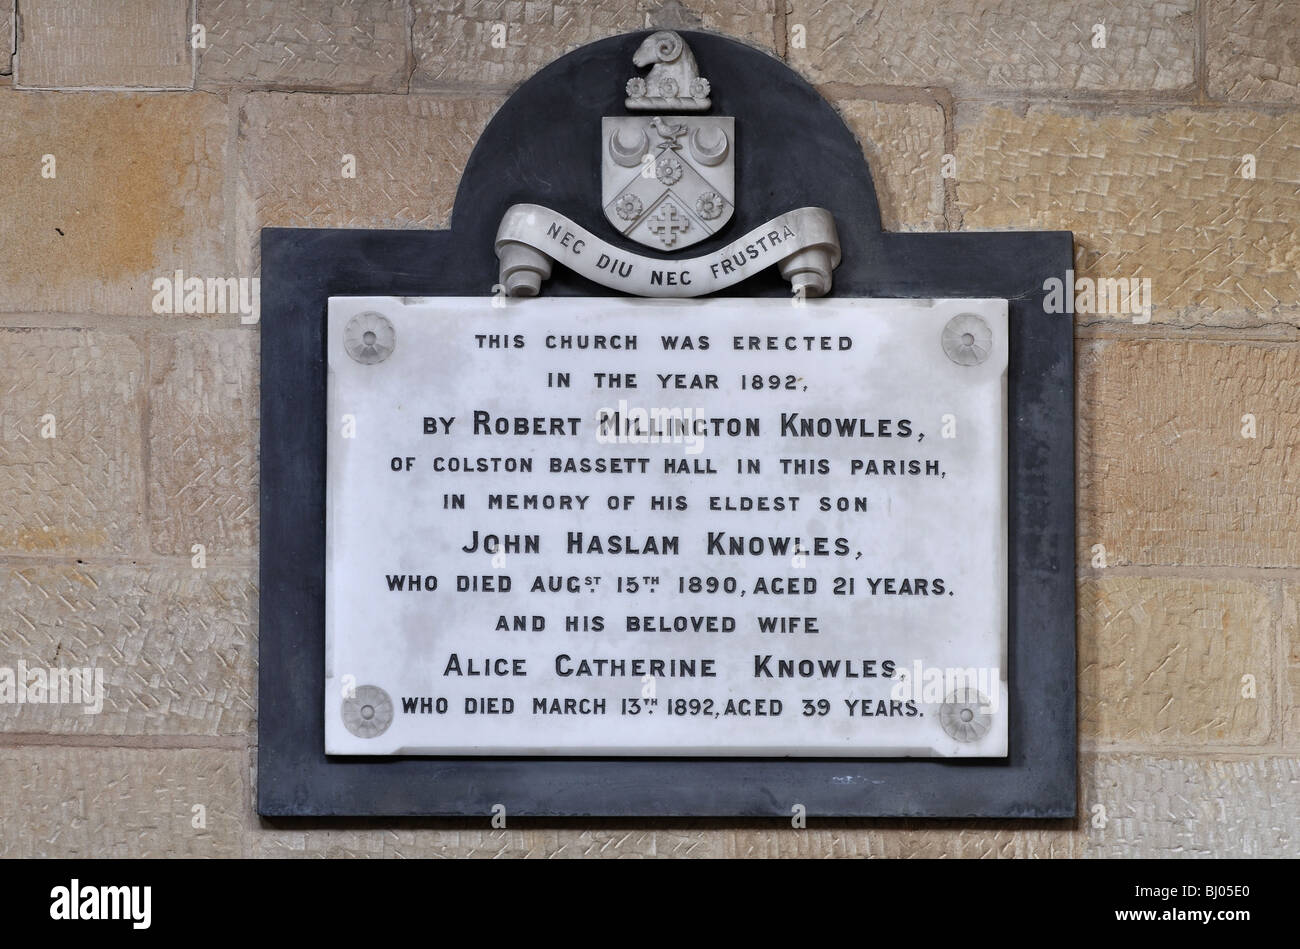 Wall plaque in St. John the Divine Church, Colston Bassett, Nottinghamshire, England, UK - Stock Image